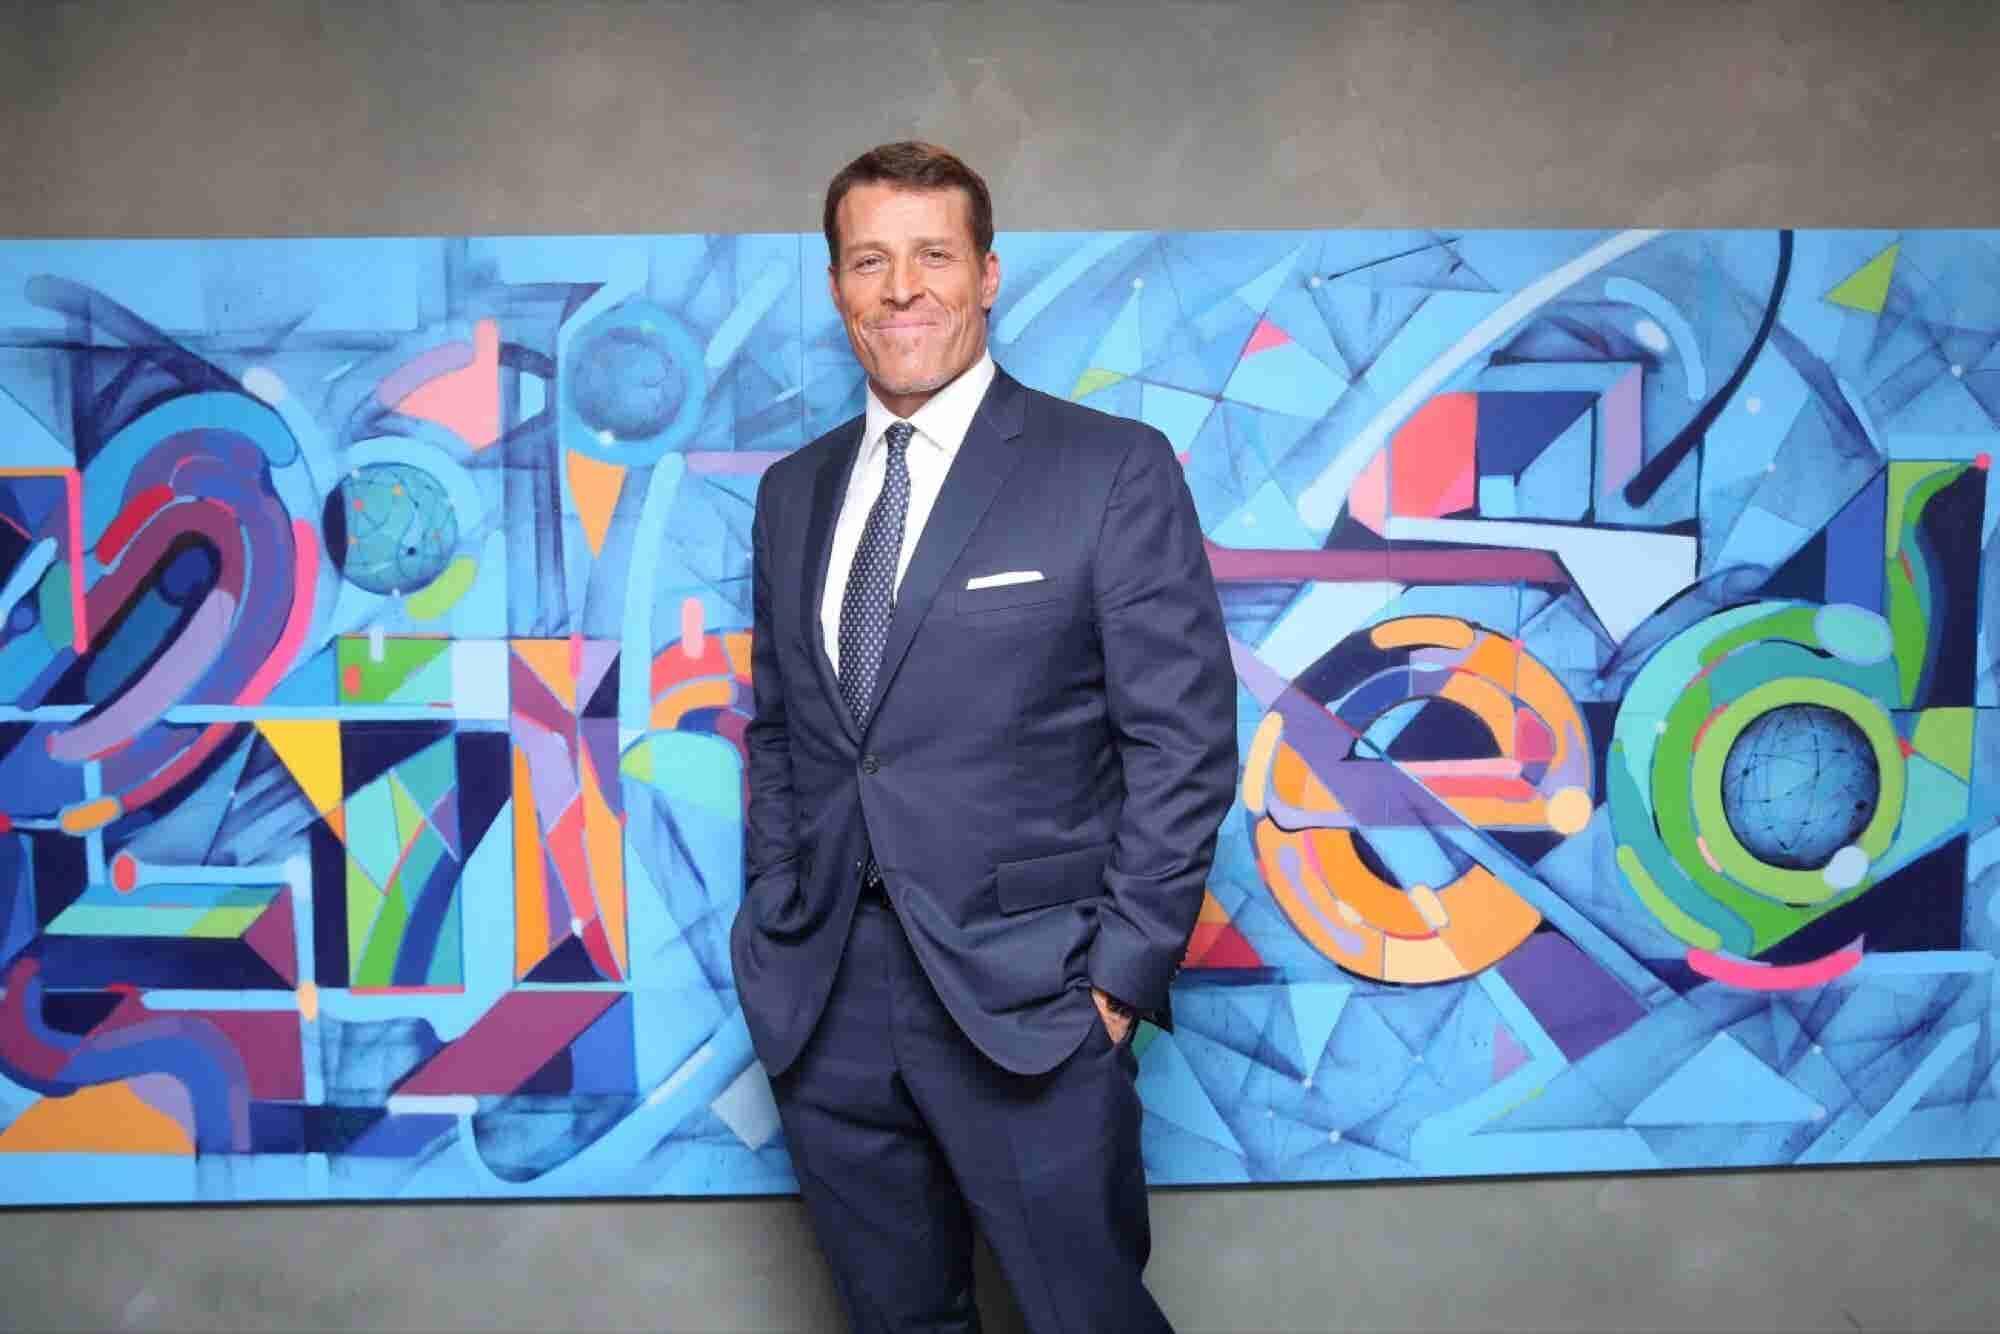 Tony Robbins' Secret to Abundance